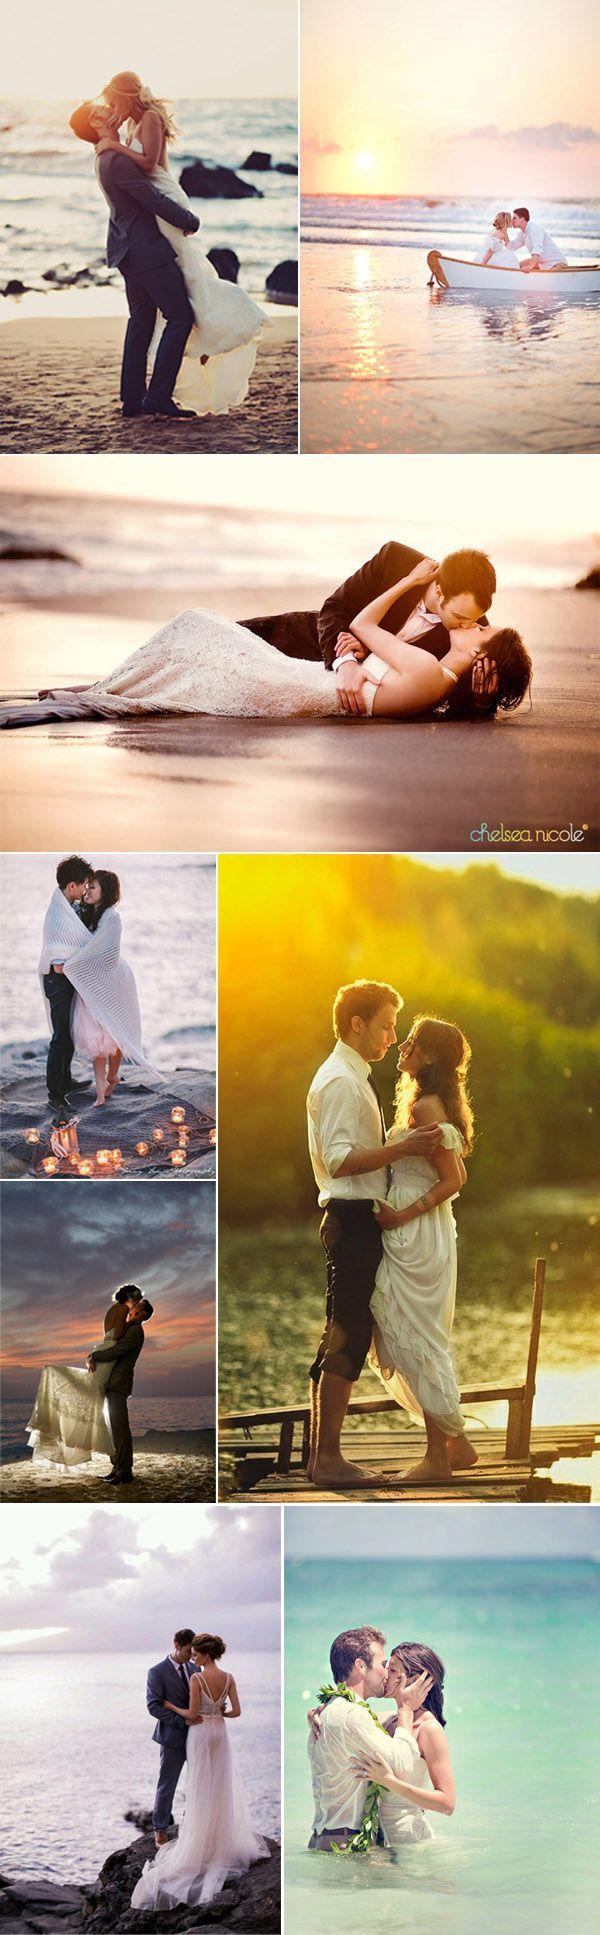 romantic beach wedding photo ideas #BeachWedding